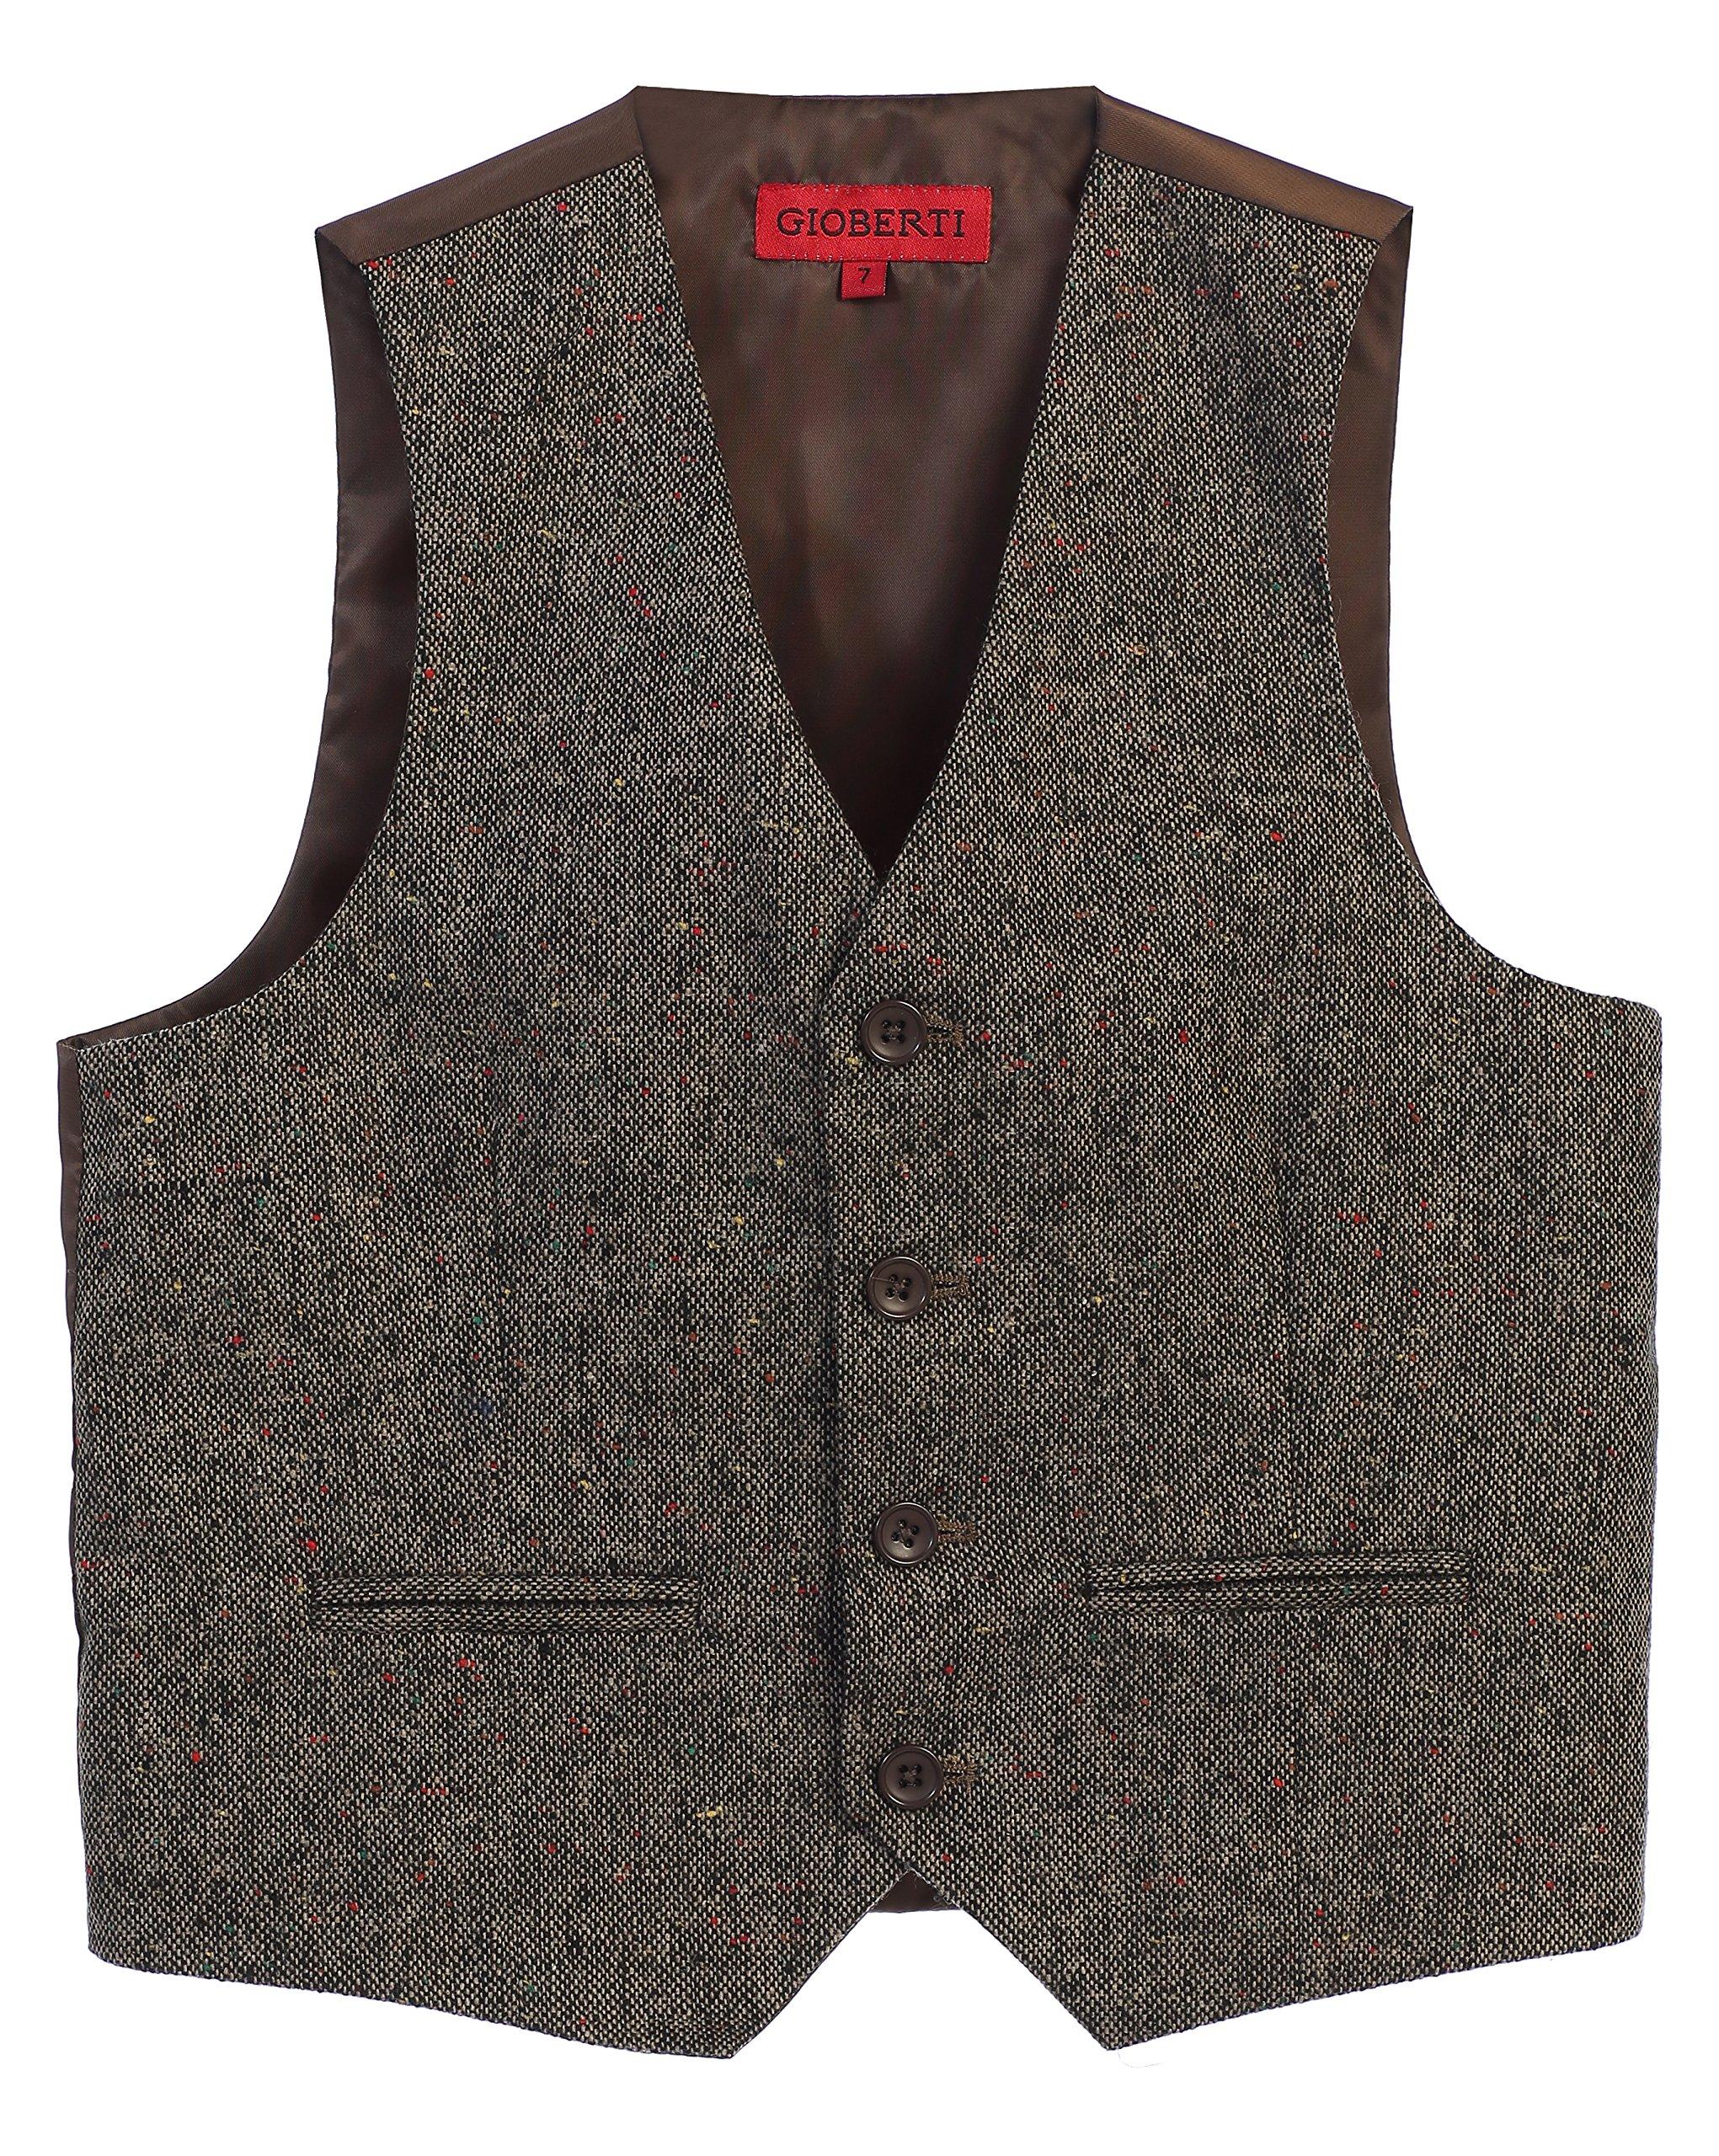 Gioberti Boy's Tweed Plaid Formal Suit Vest, Donegal Brown, Size 10